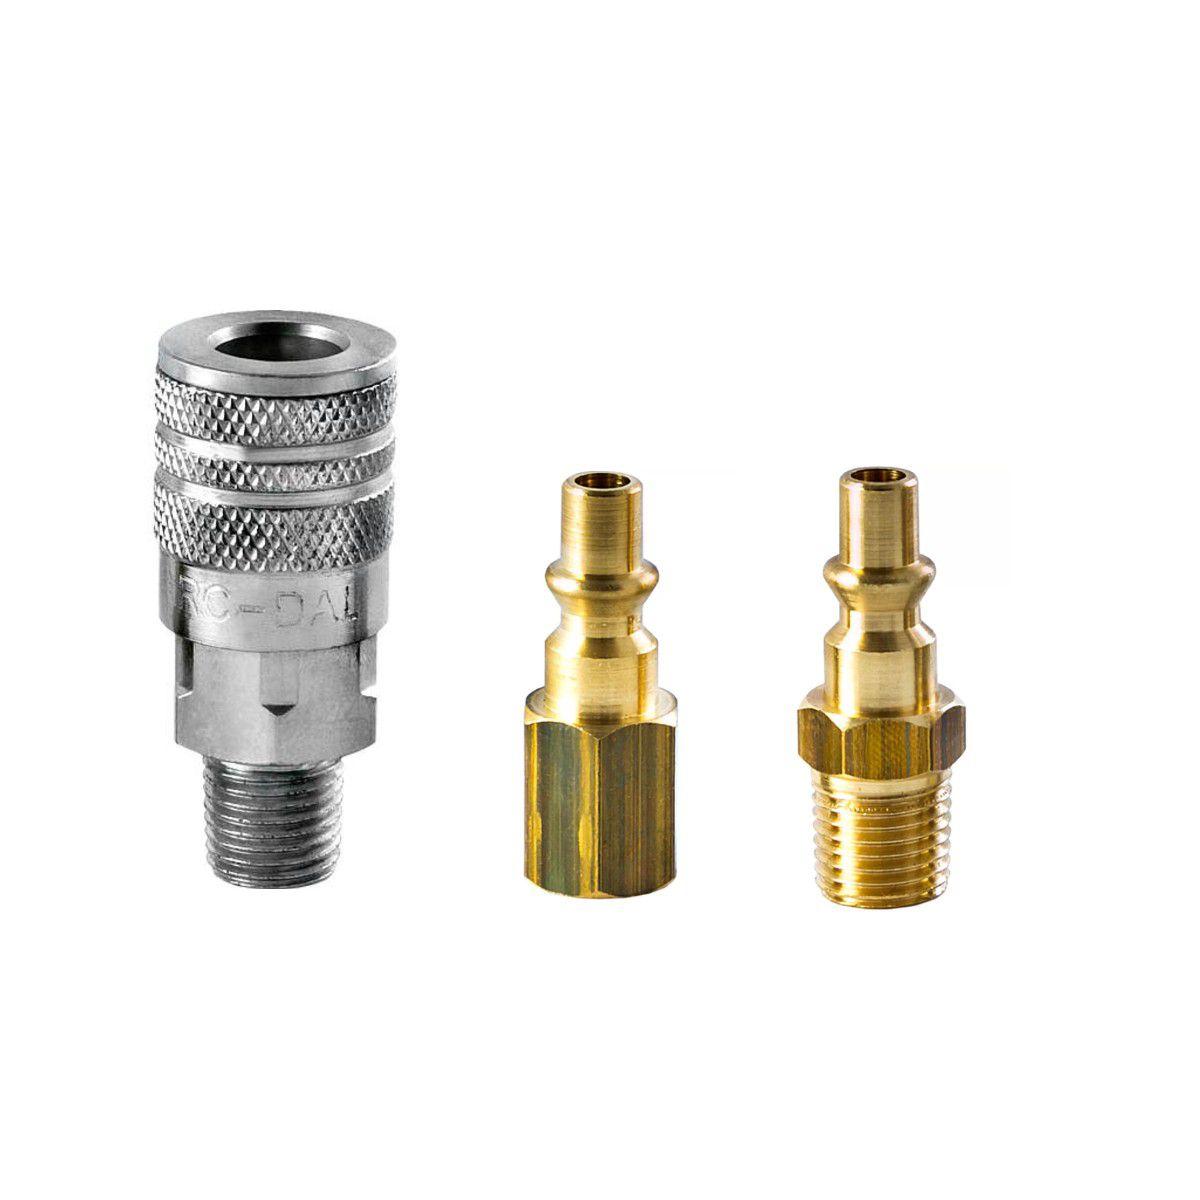 Kit Engate Rápido + Mangueira Ar Compressor 5/16 X 10 Mt